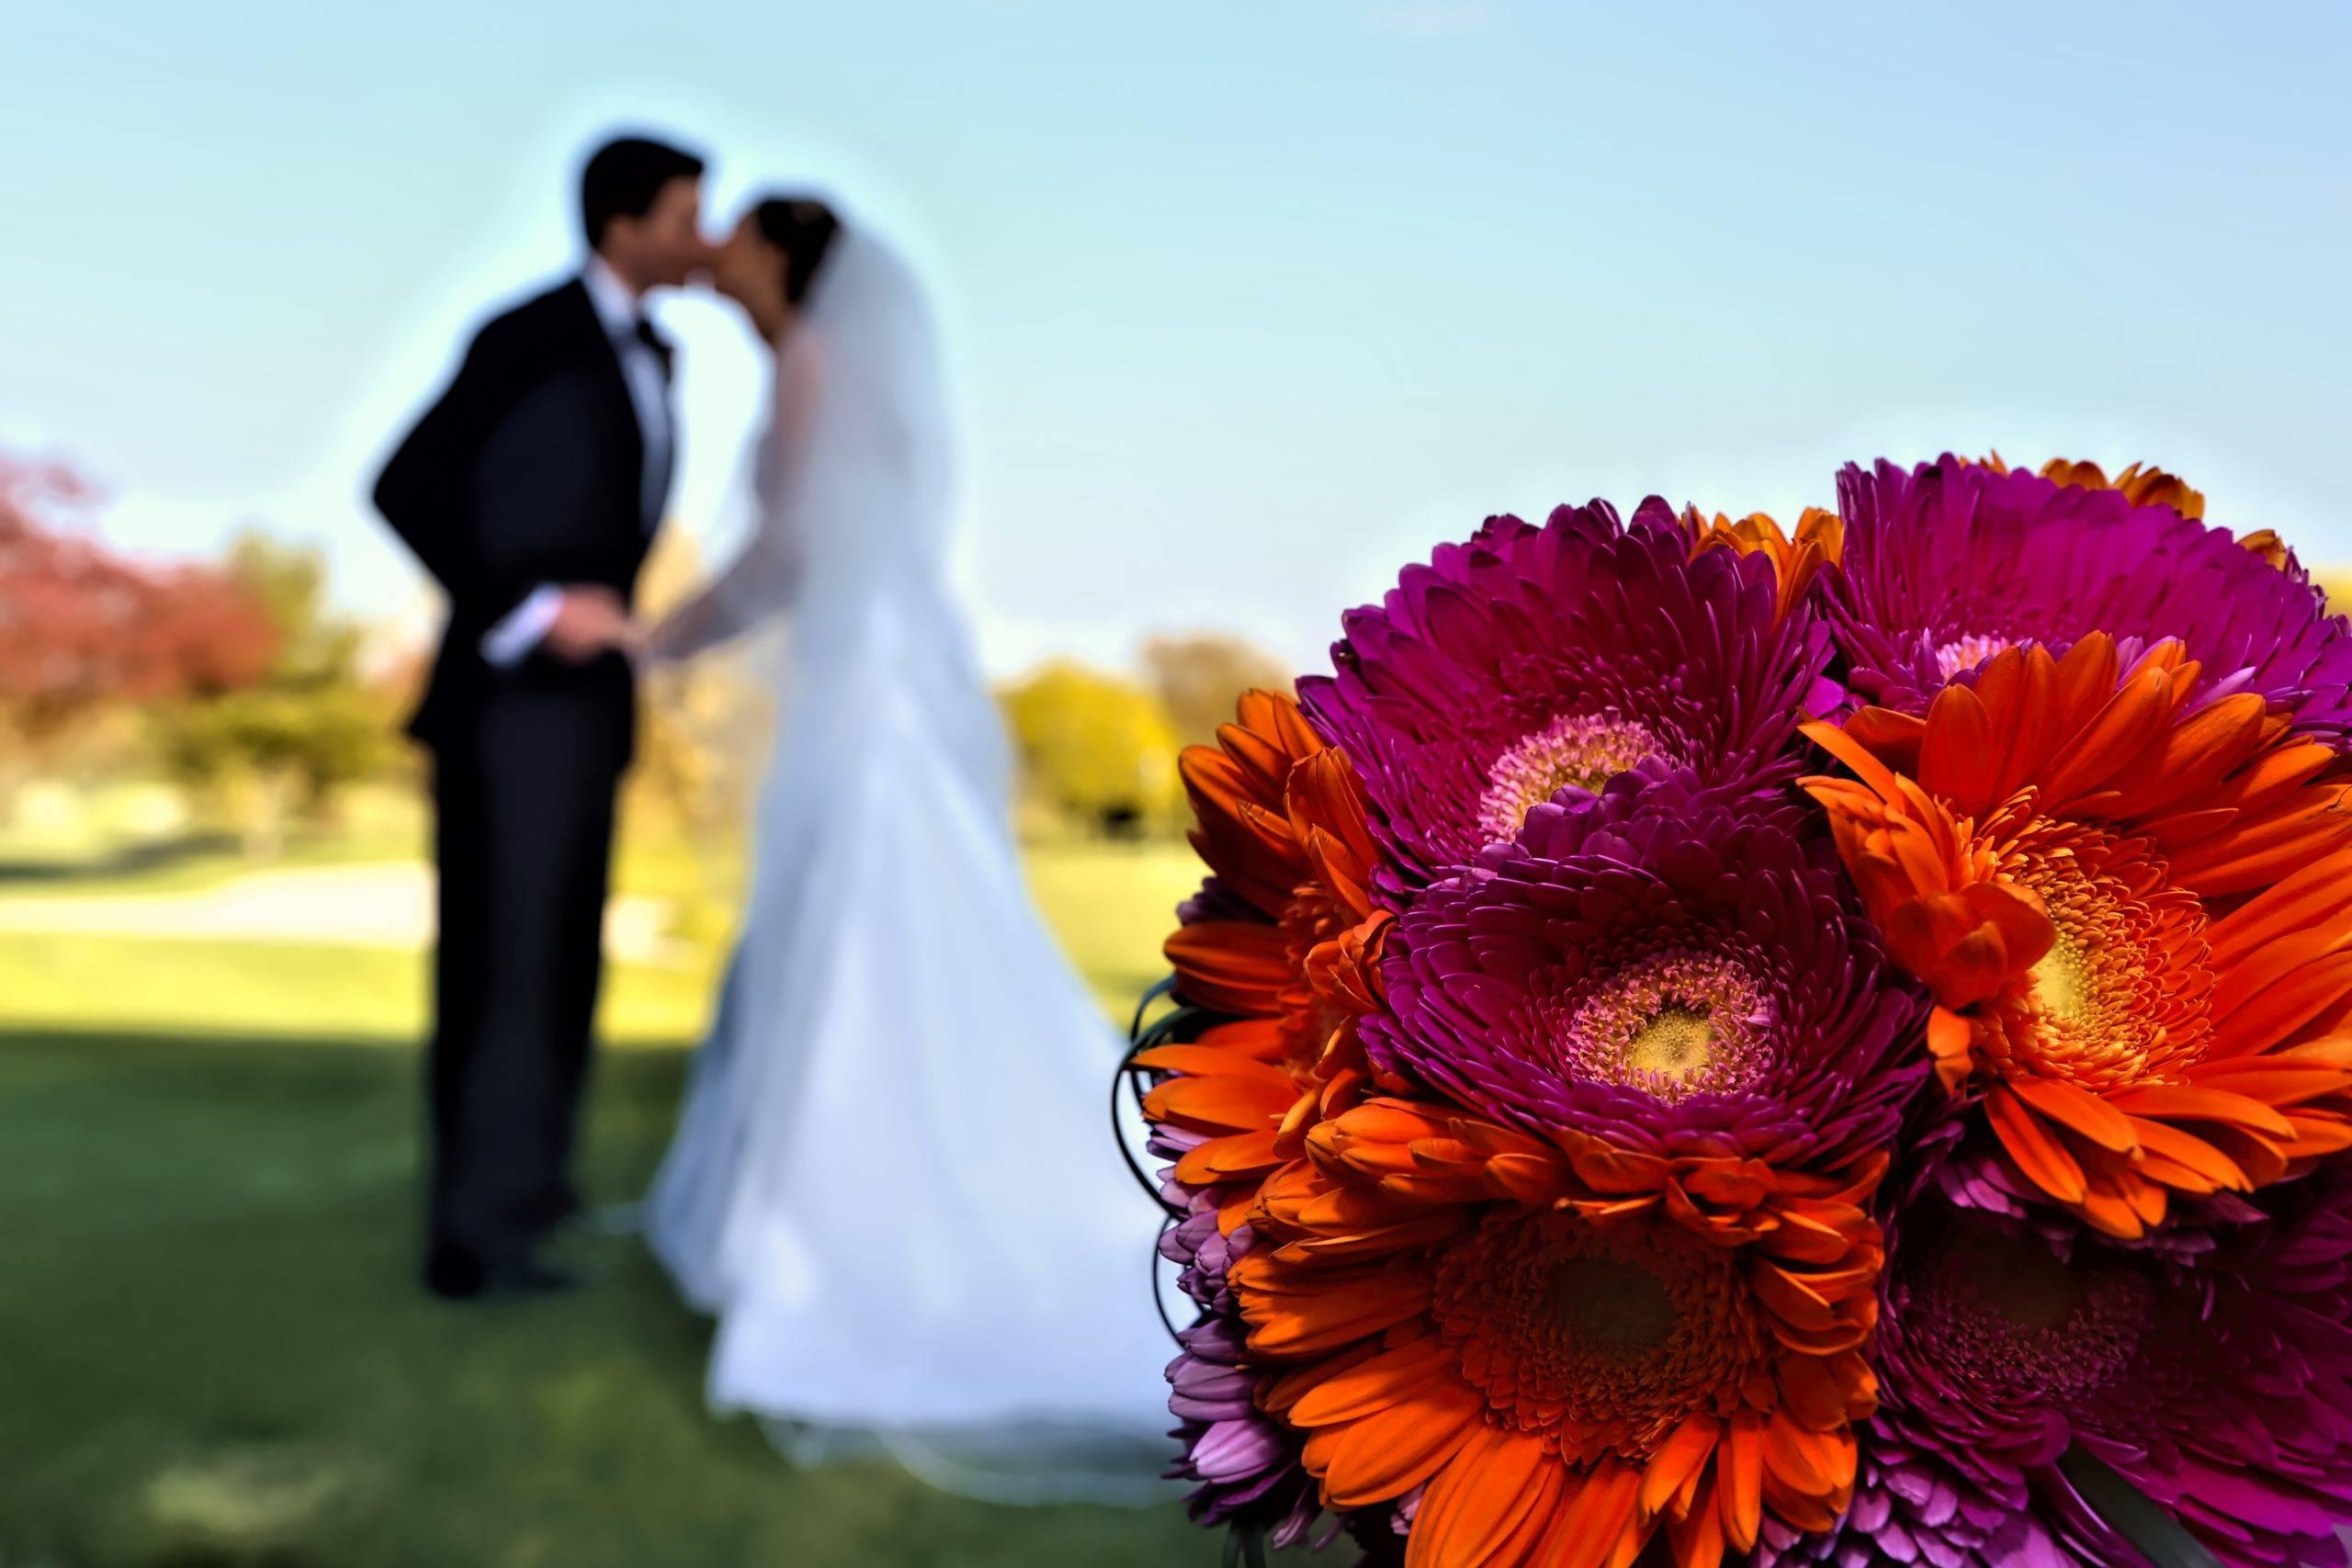 Basking Ridge CC bride and groom steal a kiss